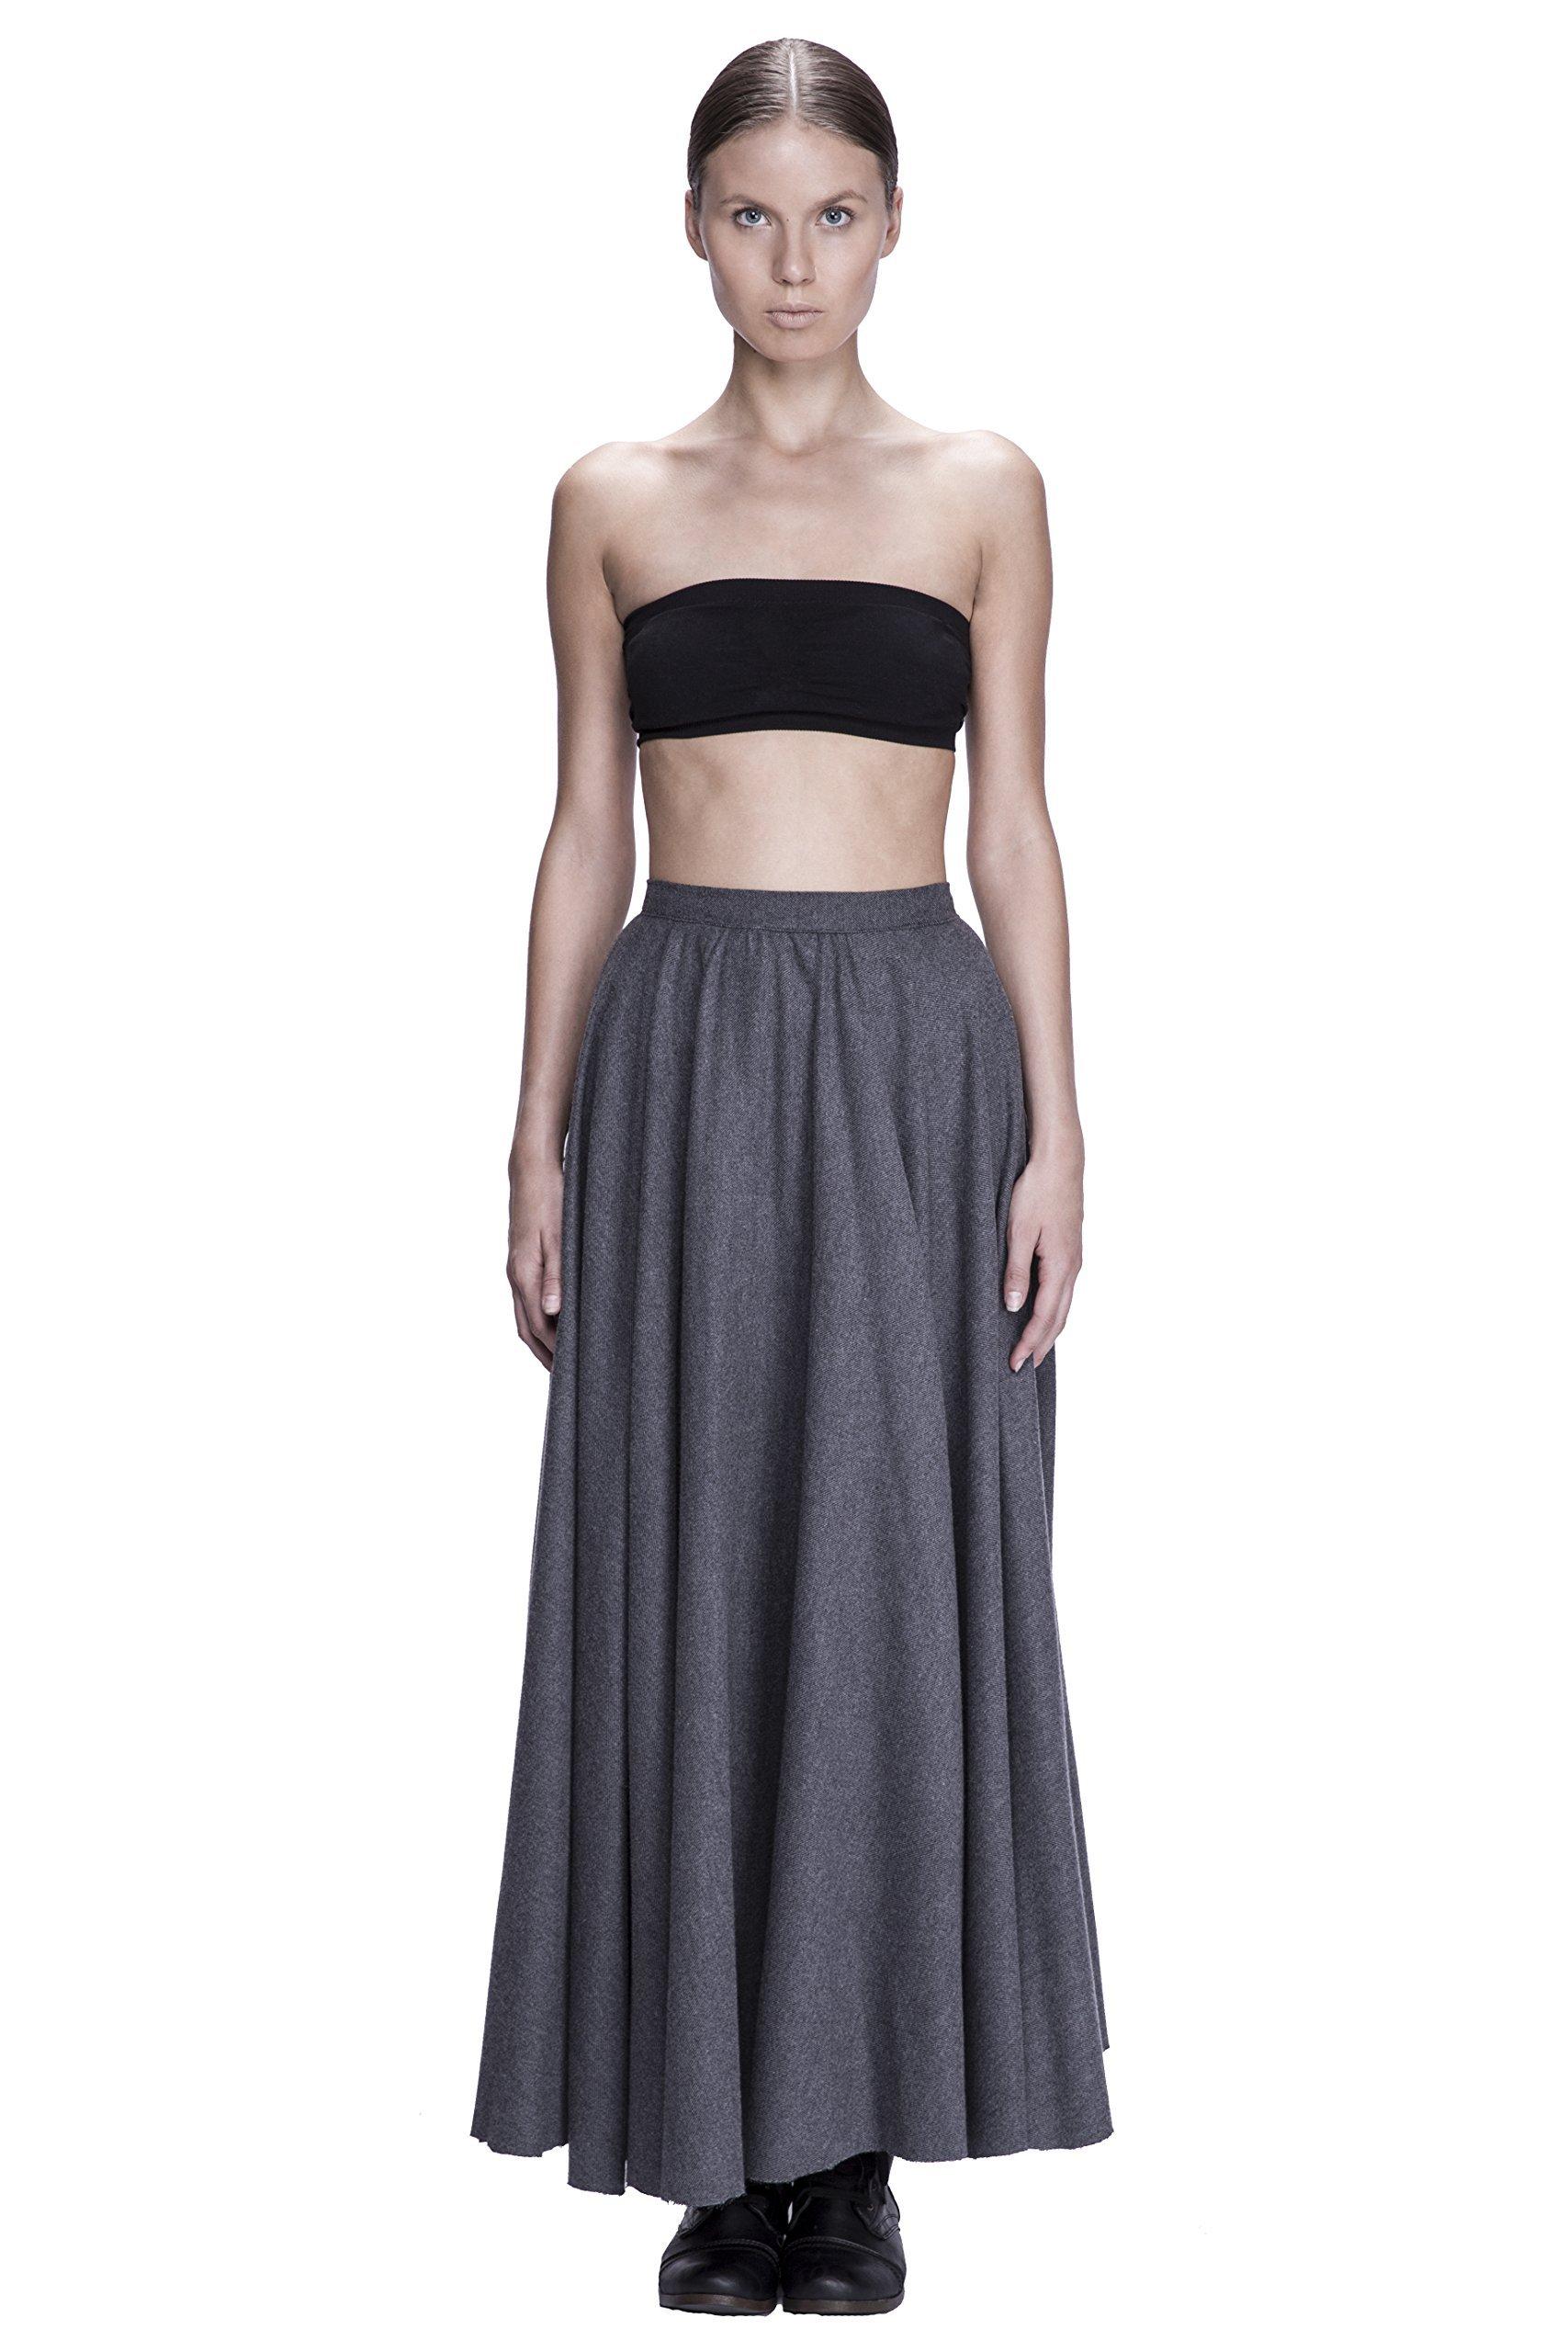 Wool Flannel Full Skirt by Corvus + Crux